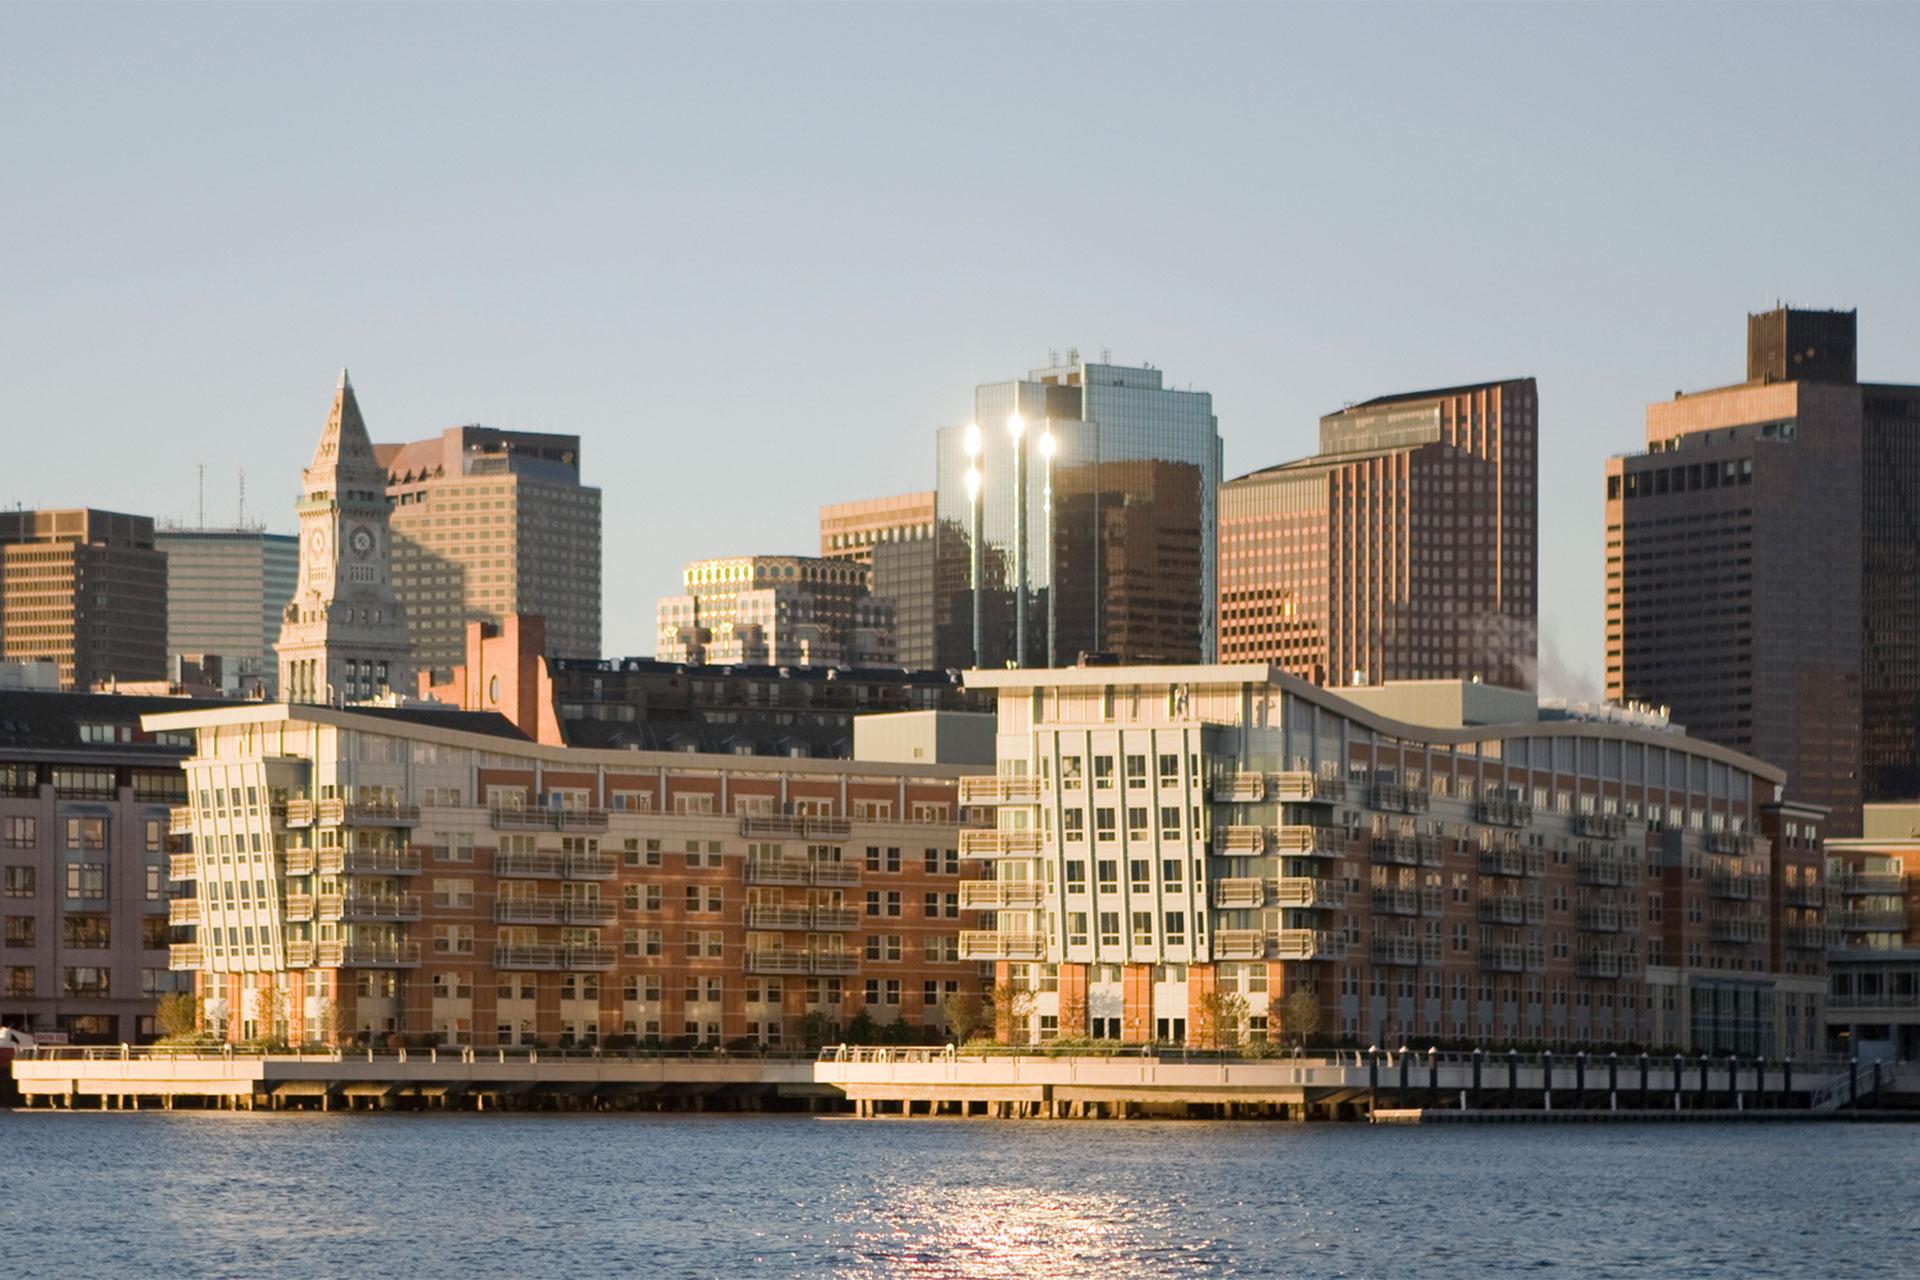 Battery Wharf Hotel, Boston Waterfront